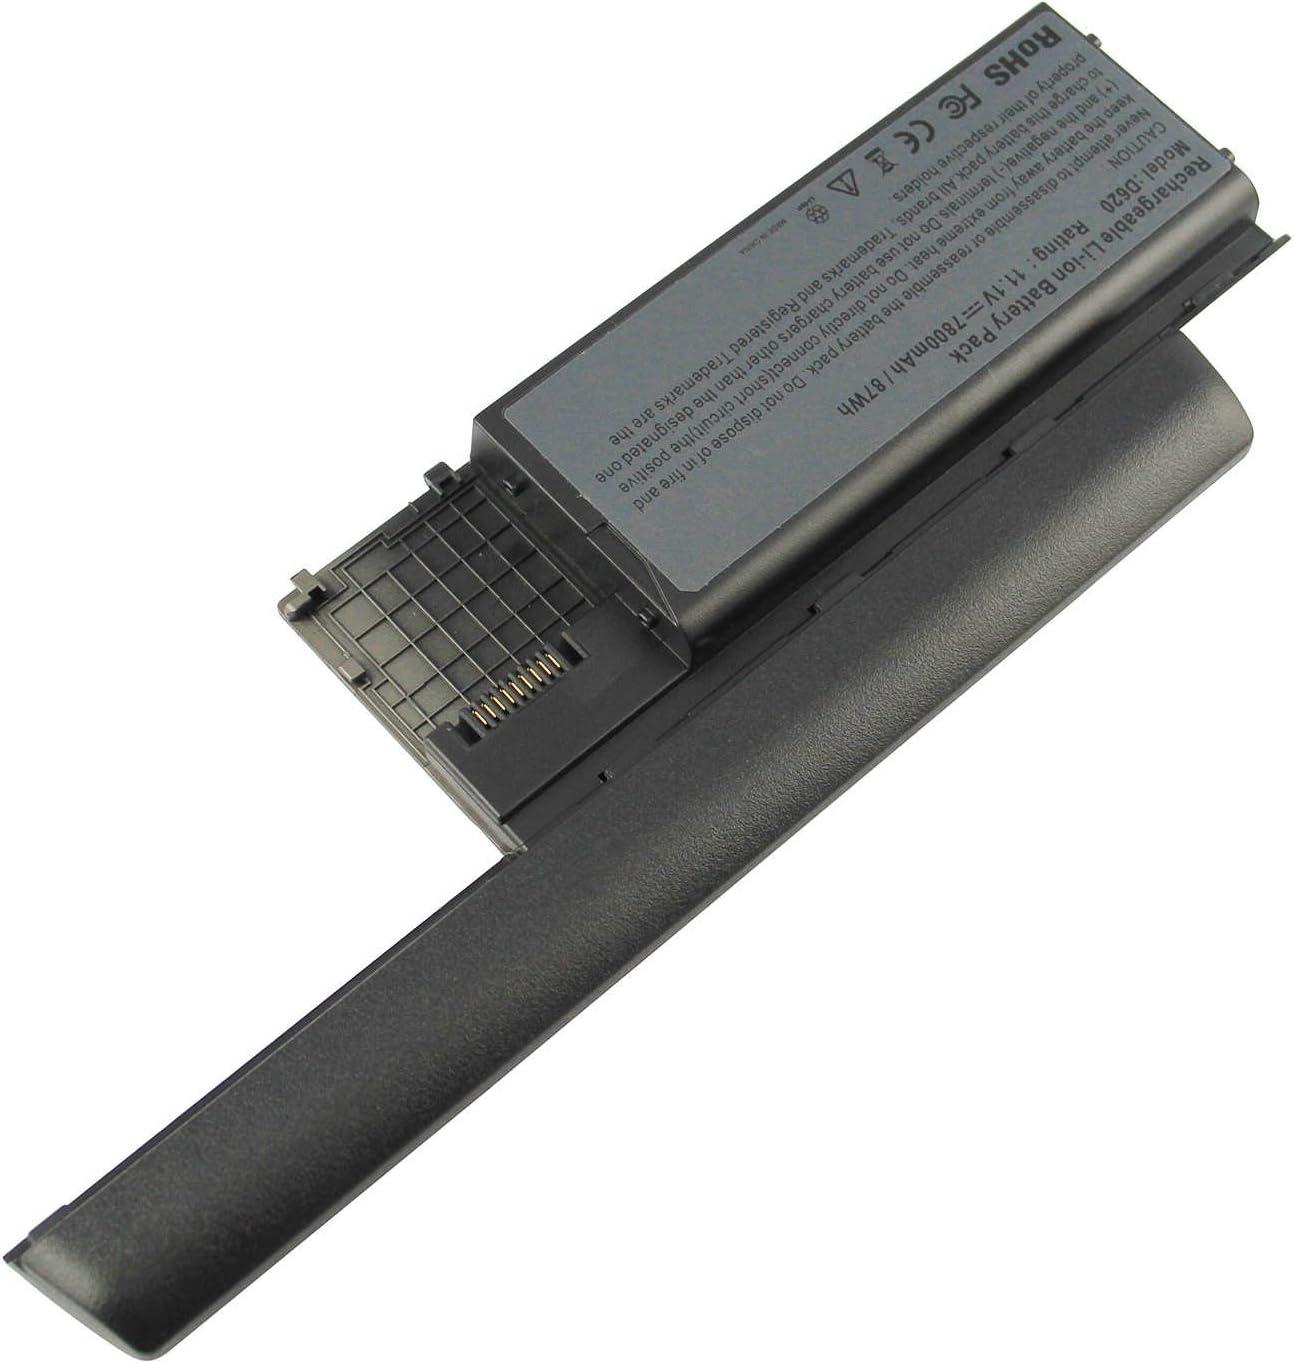 D620 Replacement Laptop Battery for Dell Latitude D630 D630N D631 D631N D830N 312-0383 TC030 310-9080 HX345 11.1V 7800mAh